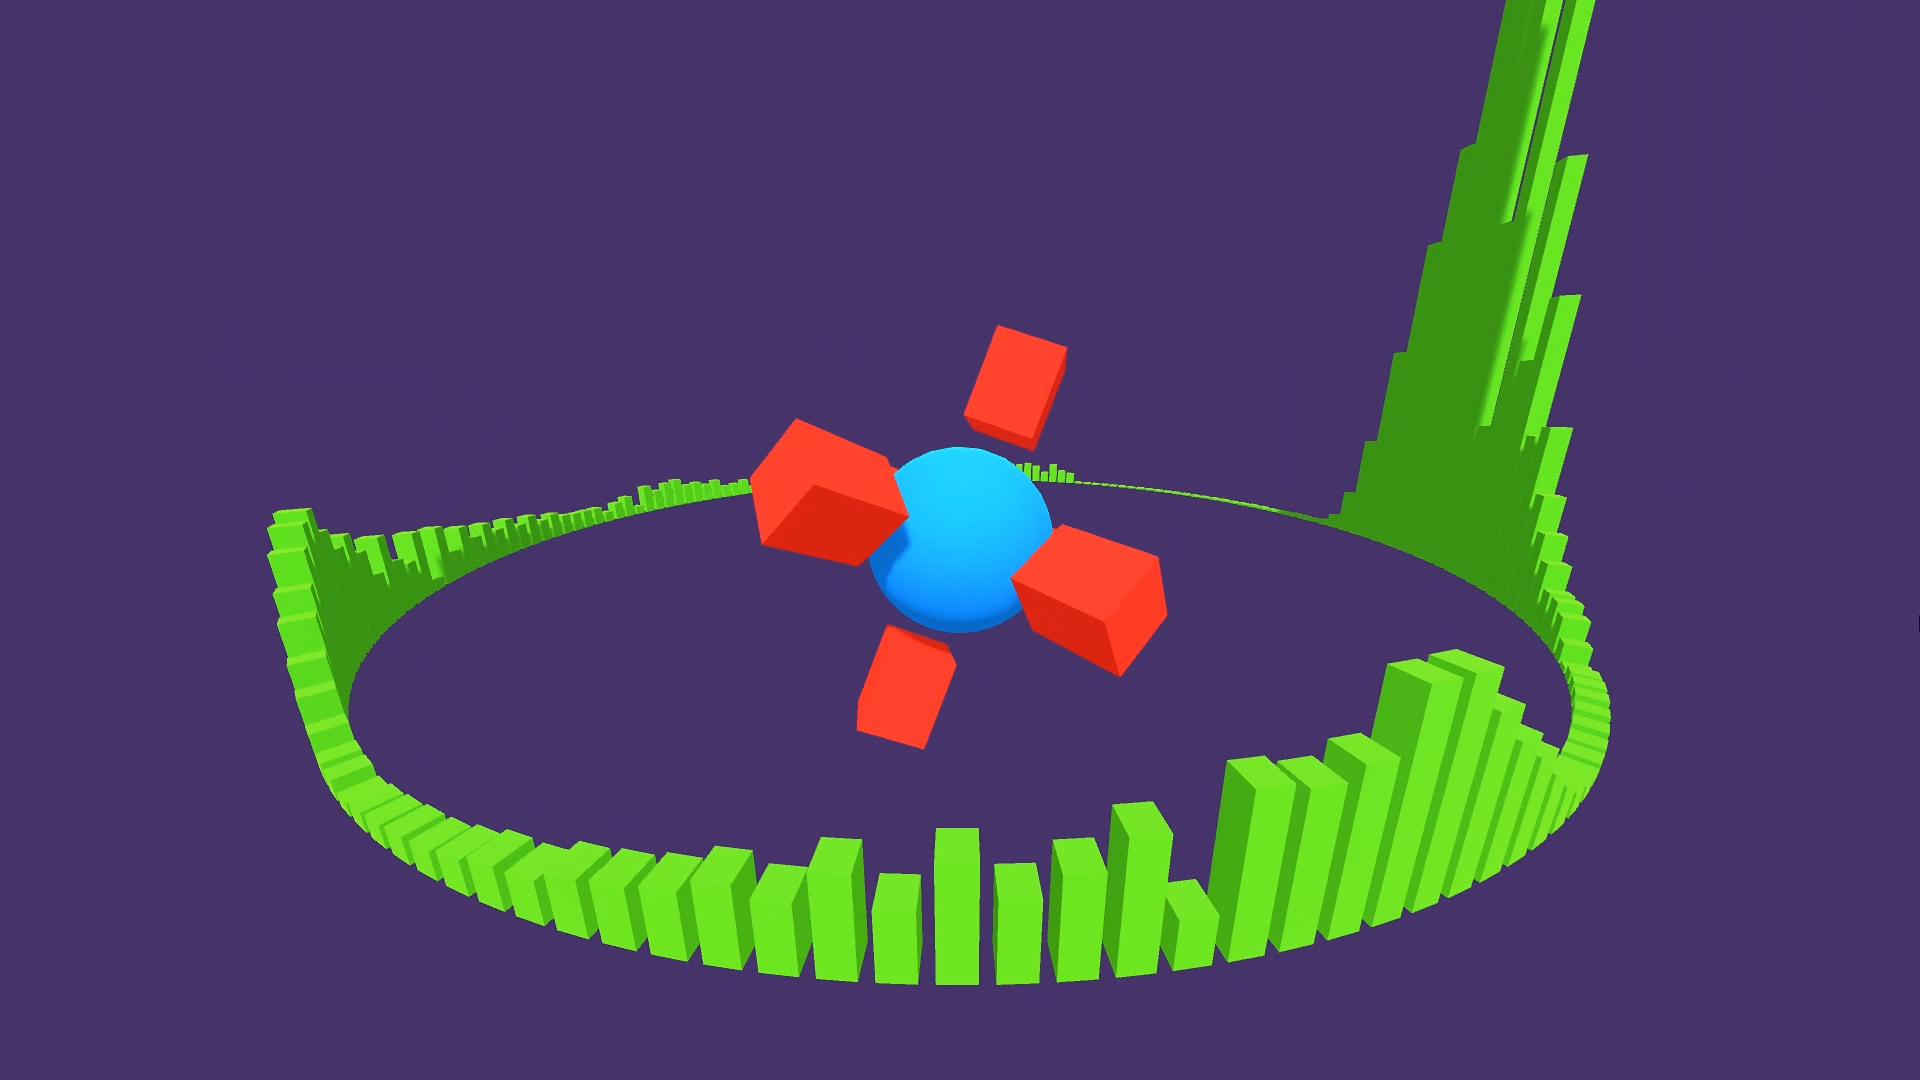 konsfik-procedural-audio-made-in-unity3d-autoplay-mode-screenshot-2